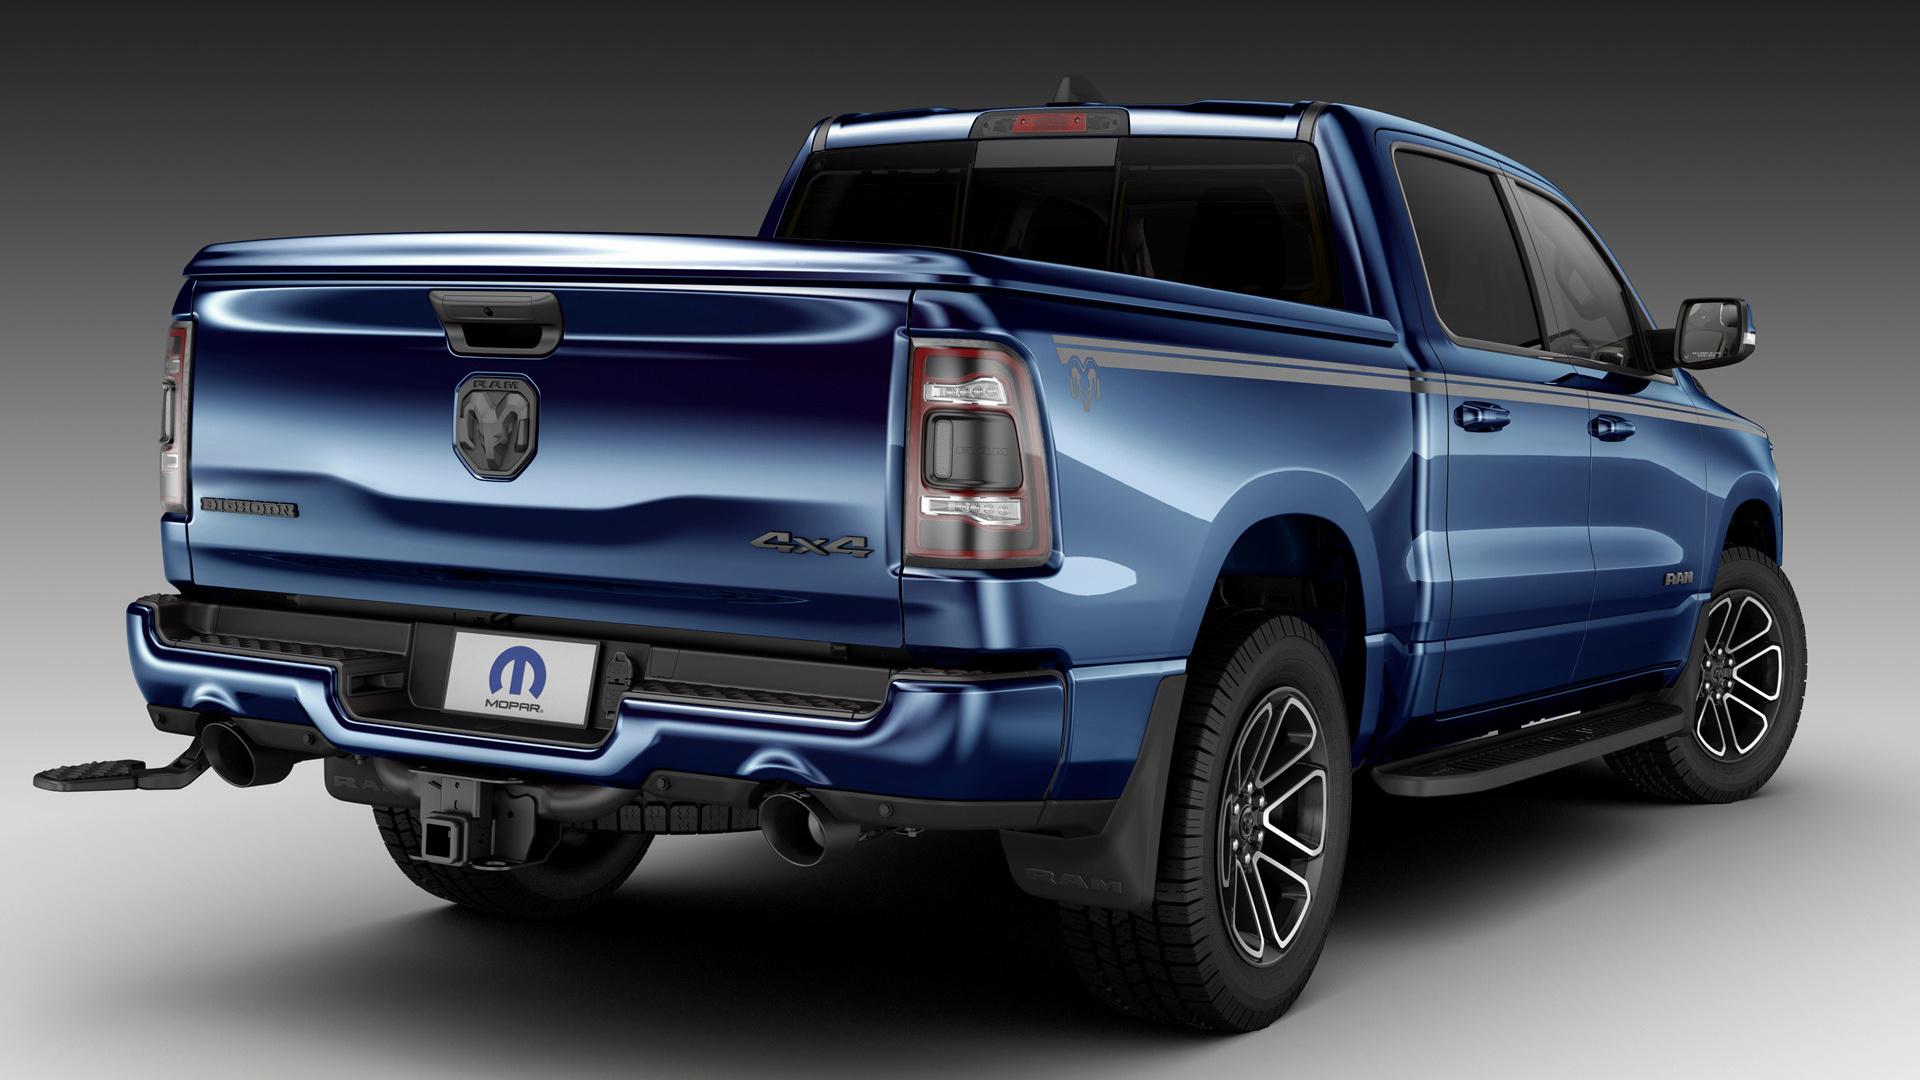 ram 1500 horn mopar parts crew cab pickup truck patriot short boss shocks wagon accessories power custom touchscreen competition inch